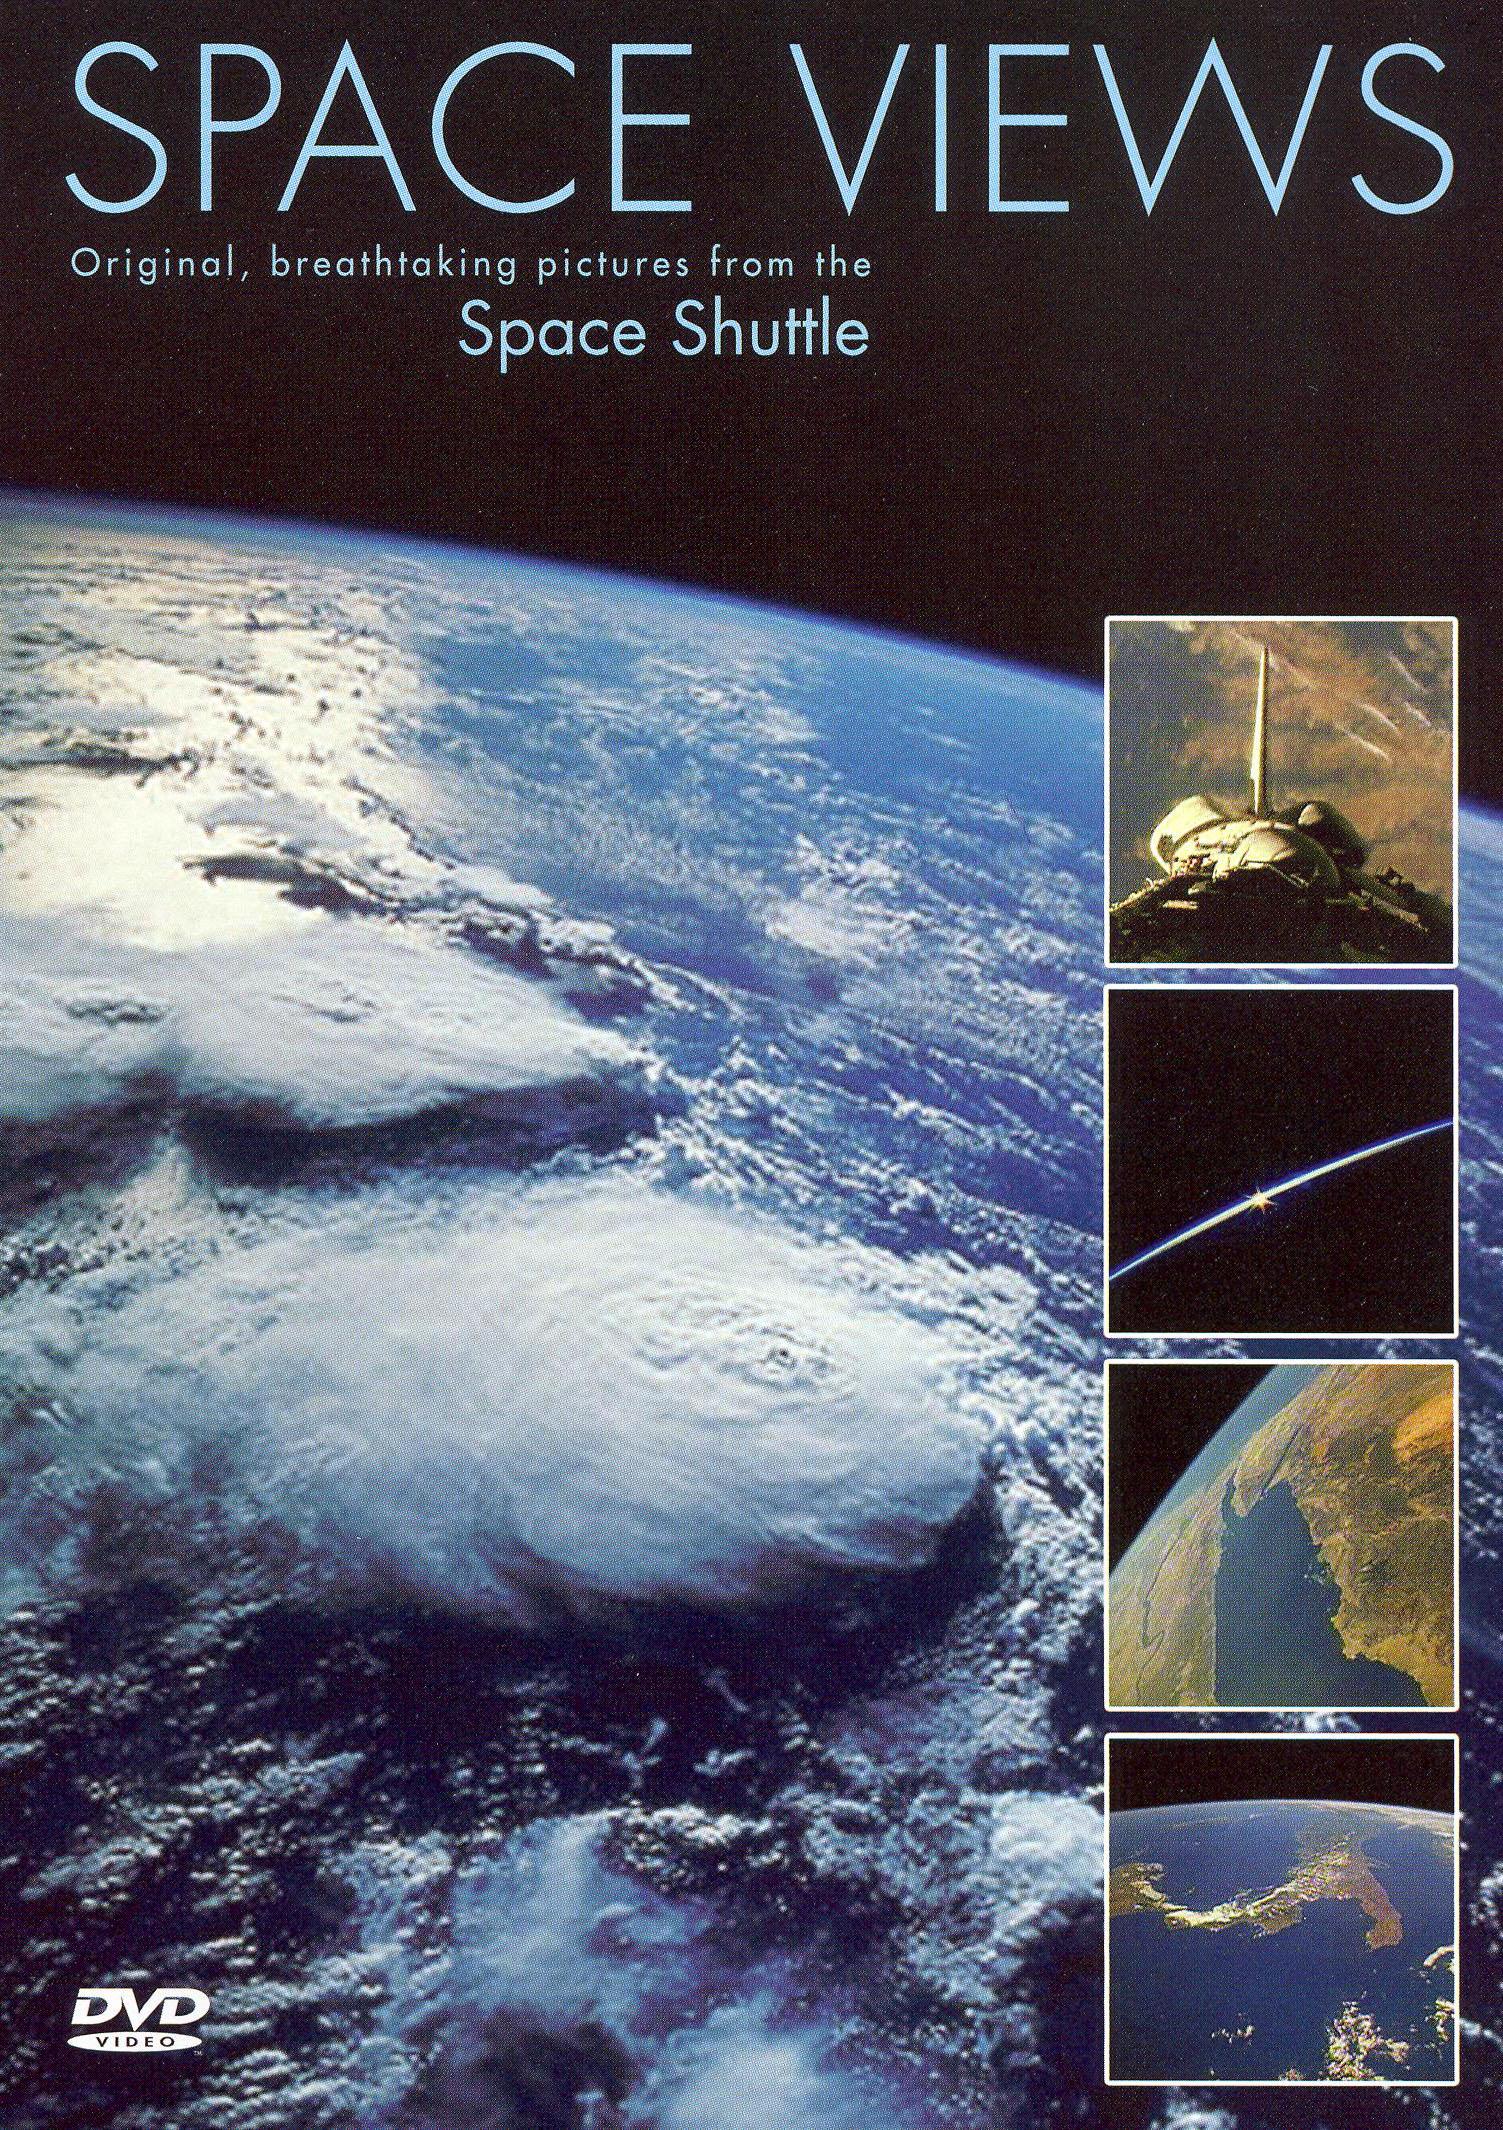 Space Views